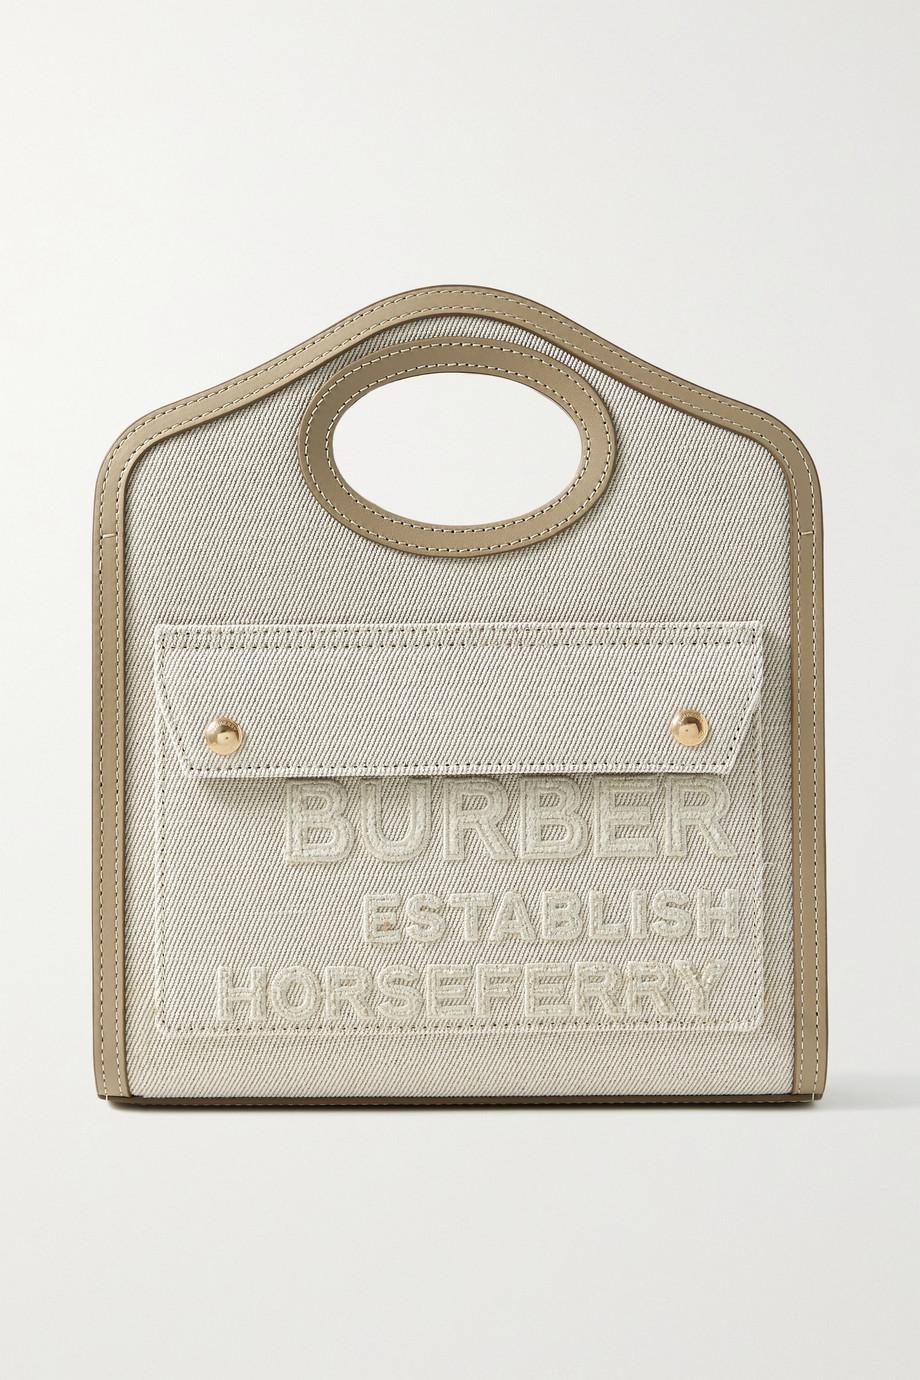 Burberry Mini leather-trimmed appliquéd canvas tote